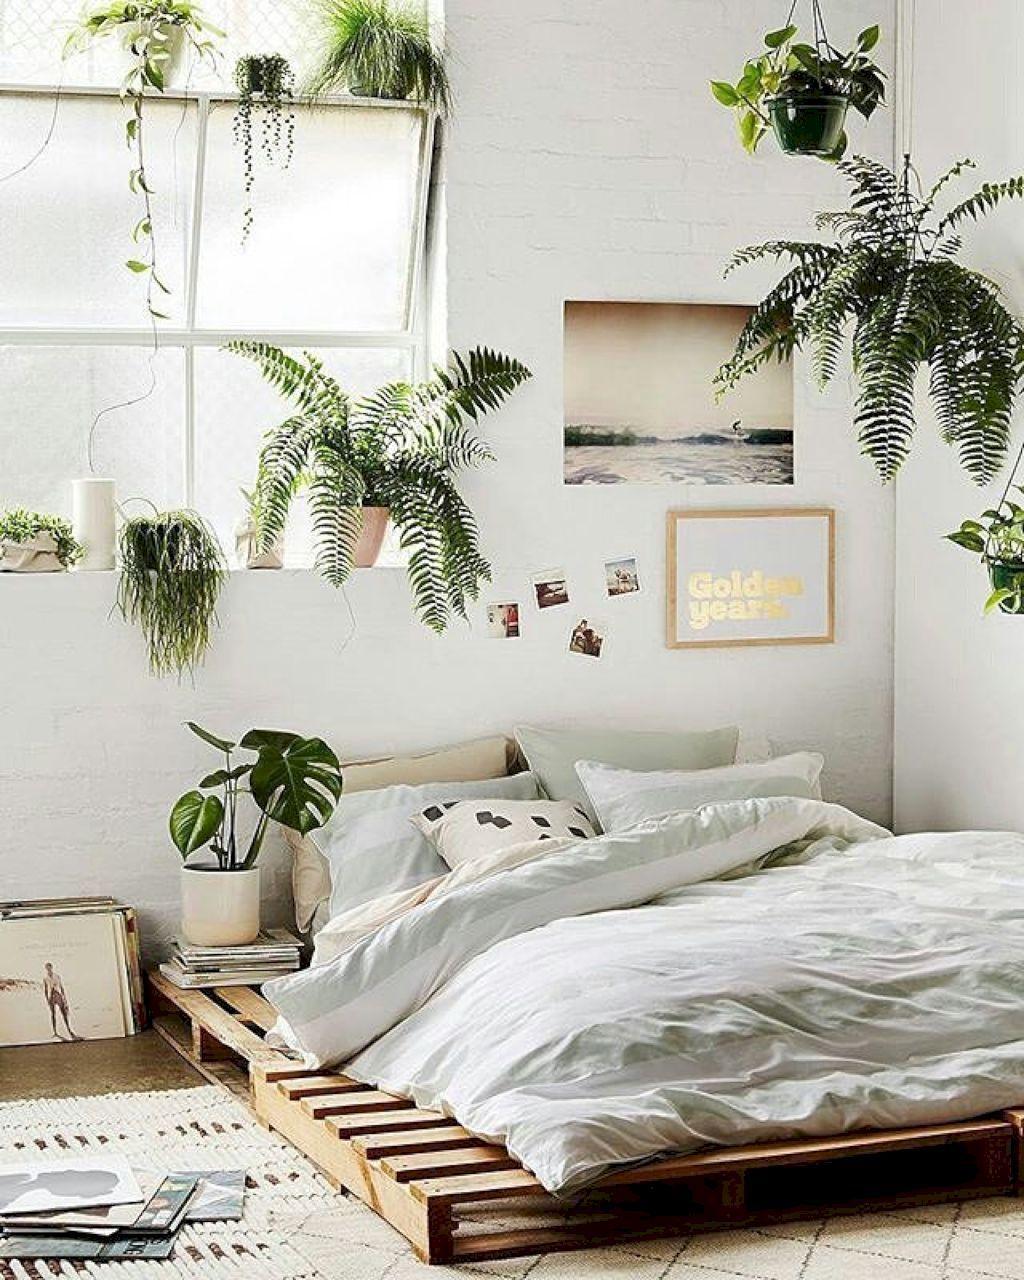 Simple Elegant Bedroom: 25 Elegant Bedroom Makeover Ideas With Small Budget